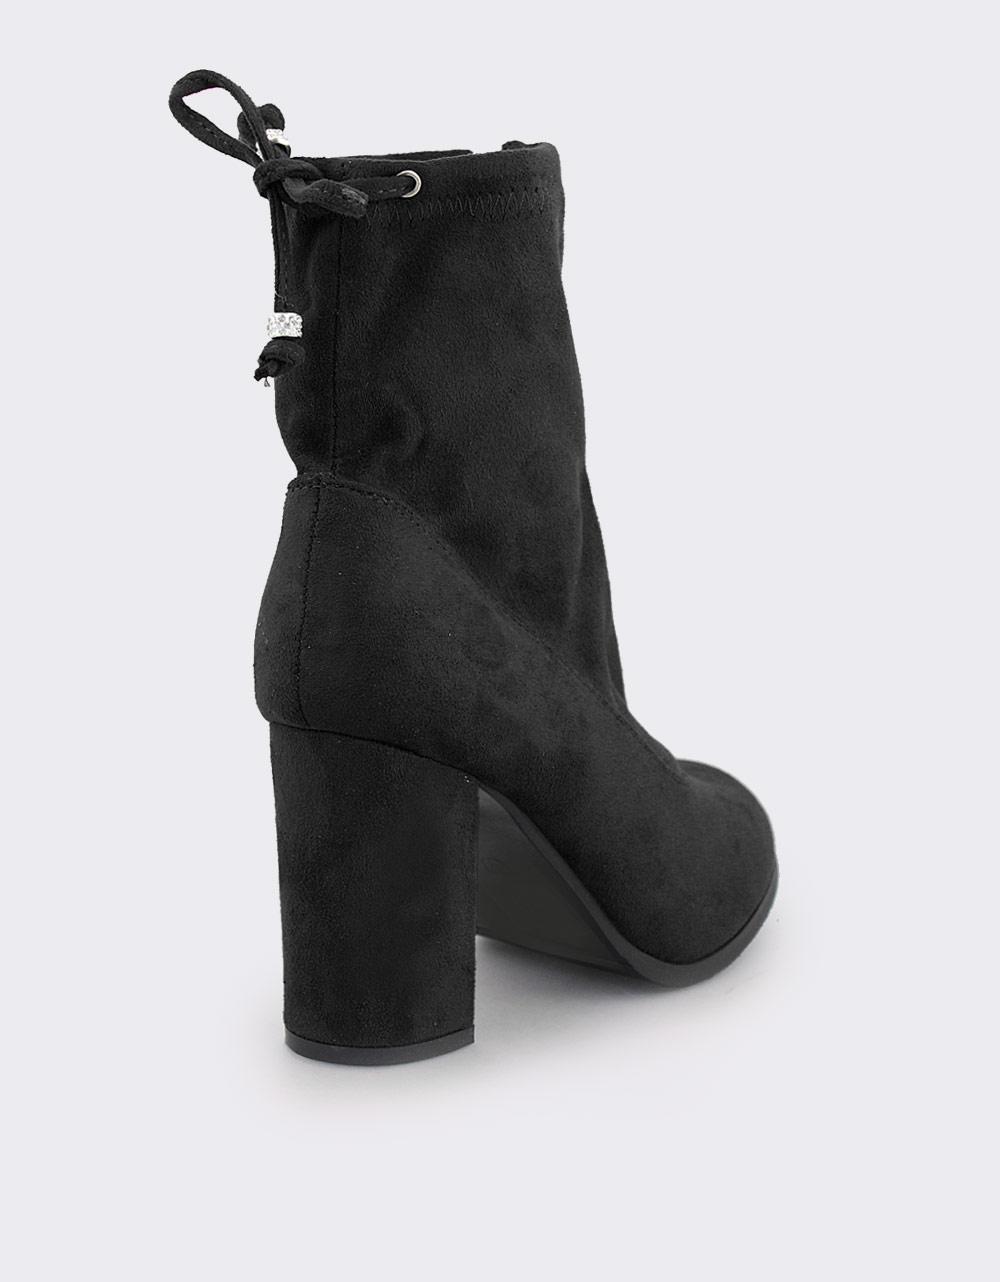 9142c5a313a4 Inshoes.gr. Γυναικεία μποτάκια με φερμουάρ | Inshoes.gr Μαύρο